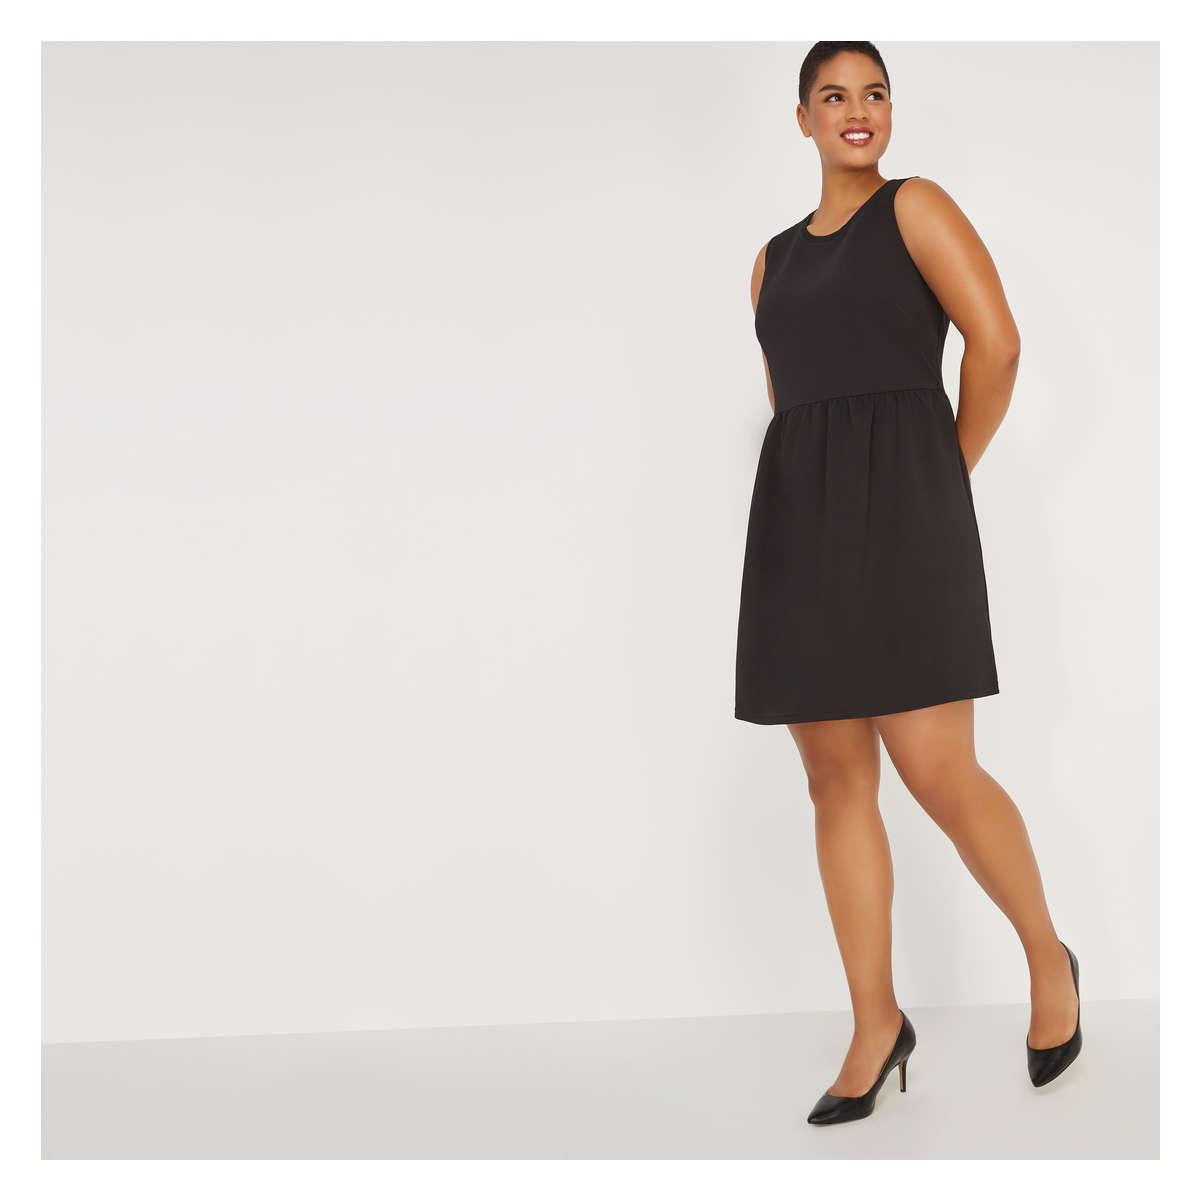 Lyst - Joe Fresh Women+ Sleeveless Pebble Dress in Black fcadbe0a8